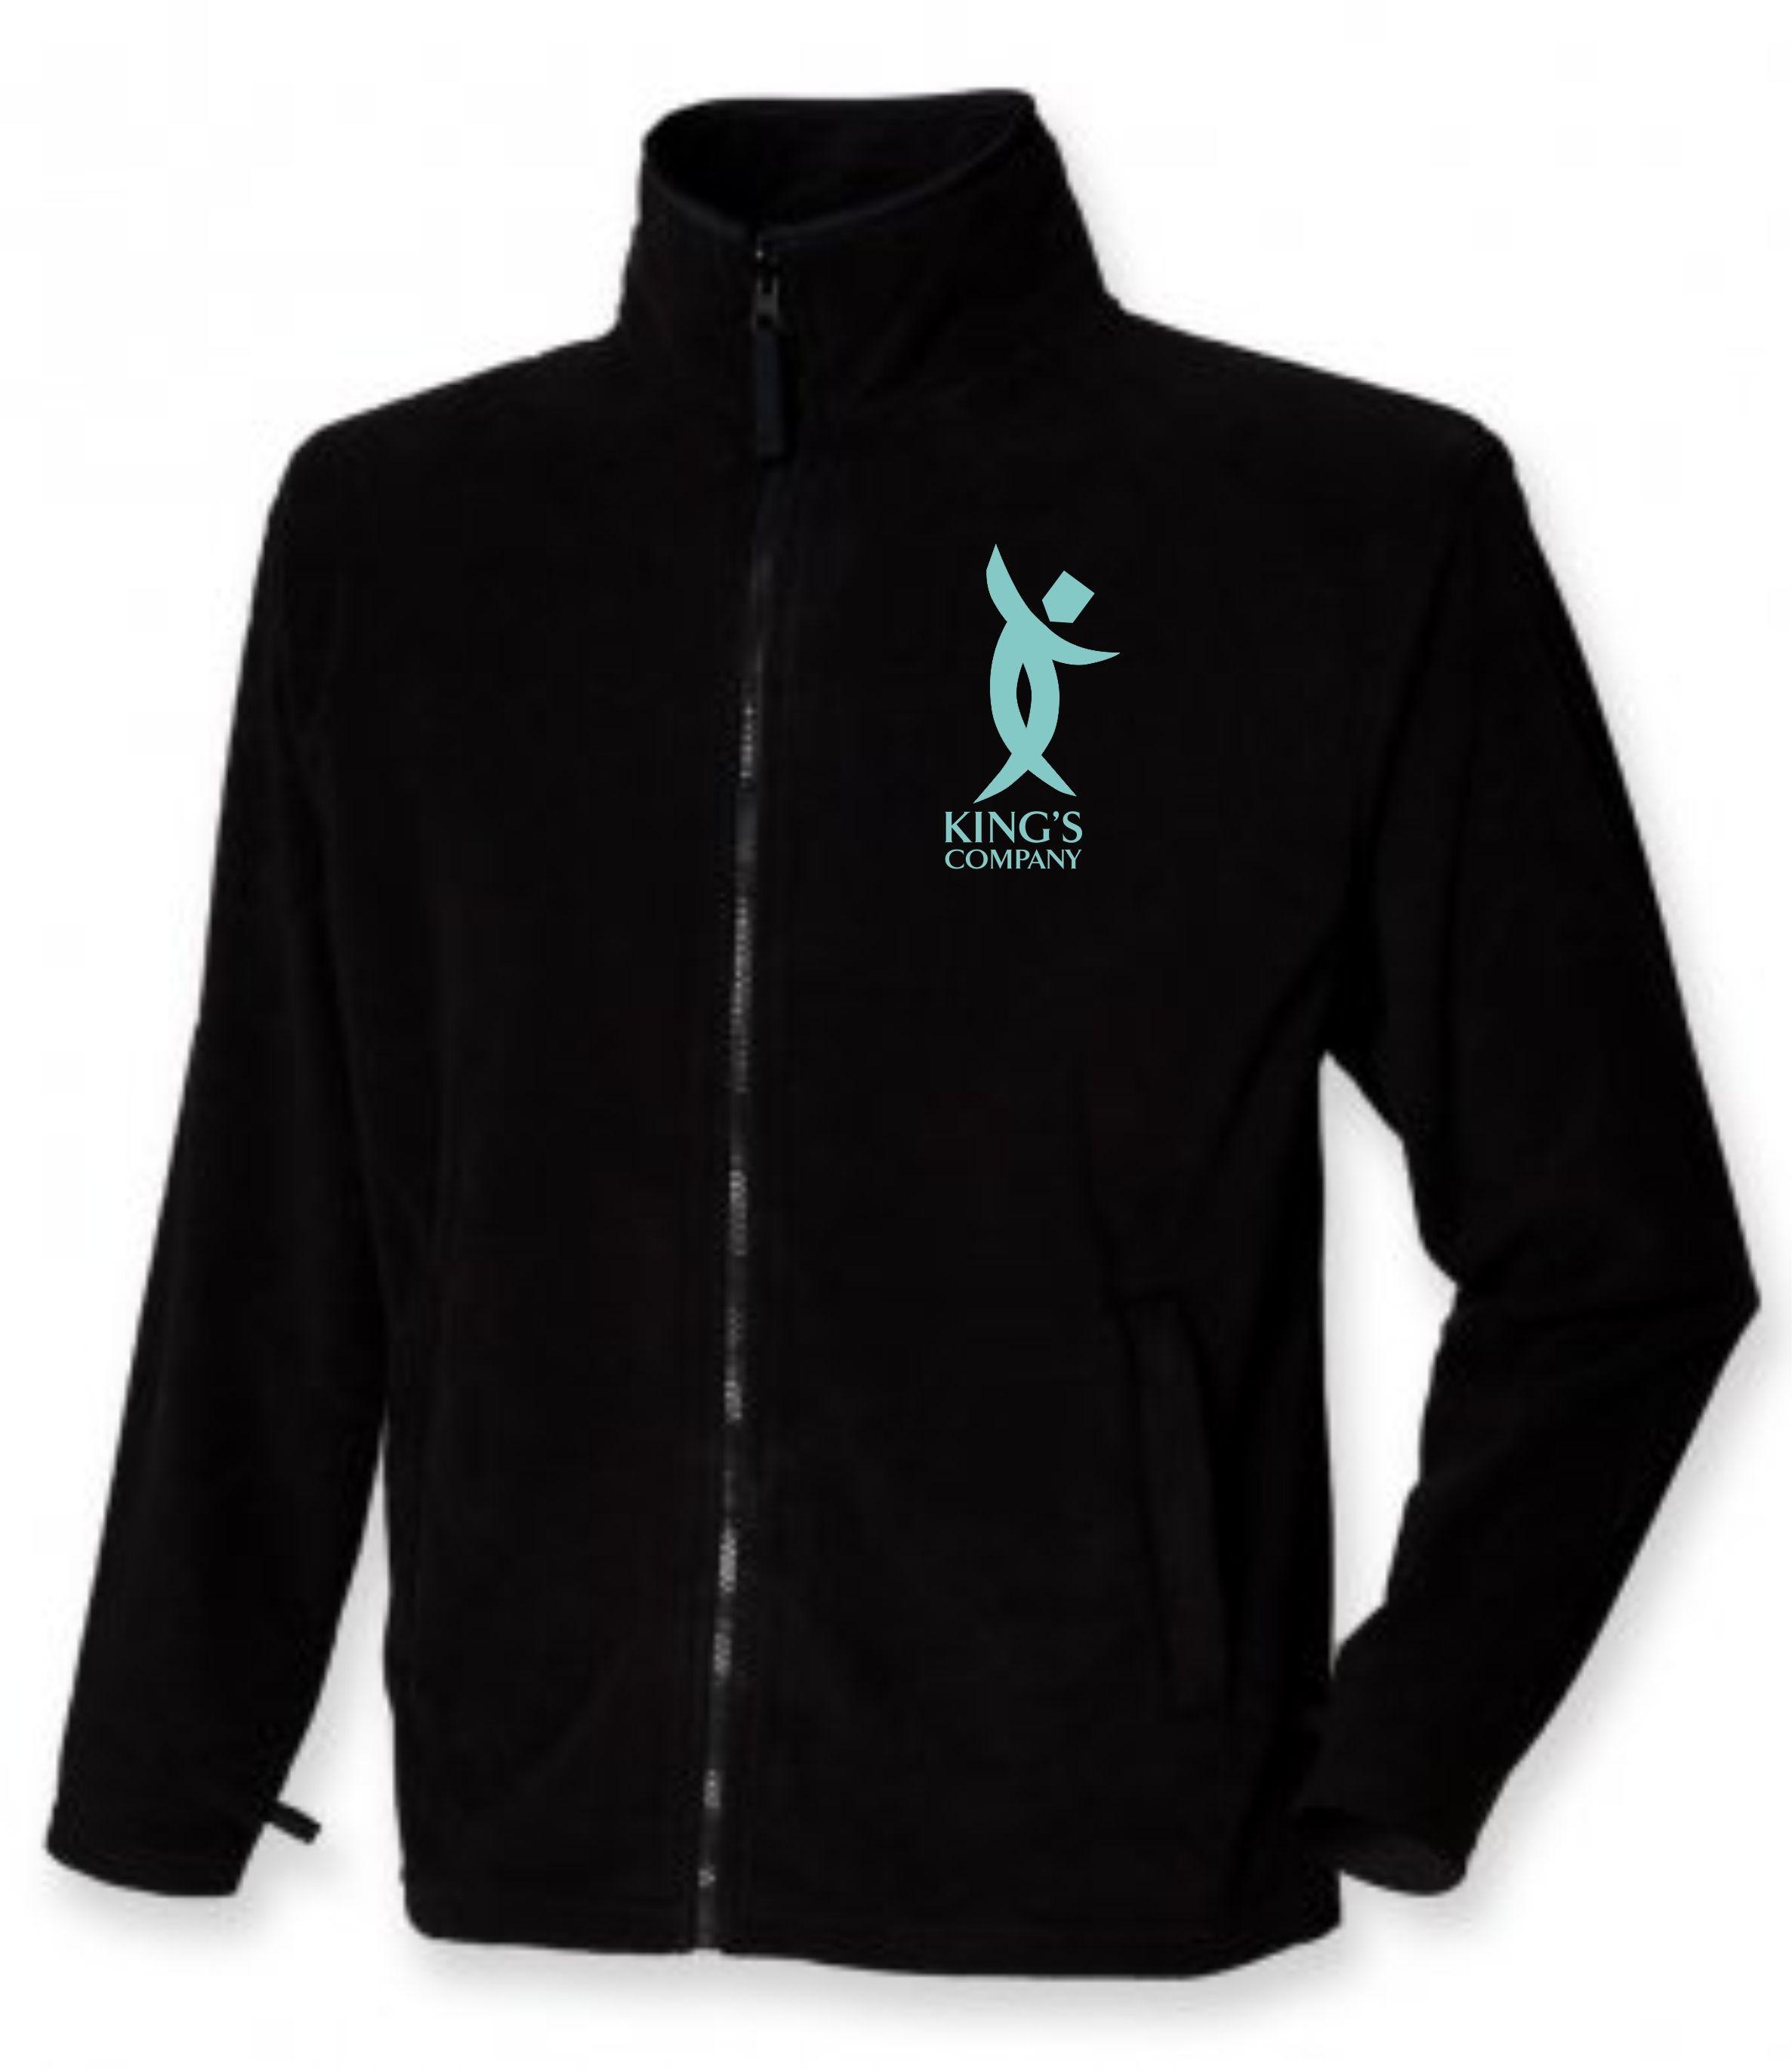 King's Company - Microfleece Jacket